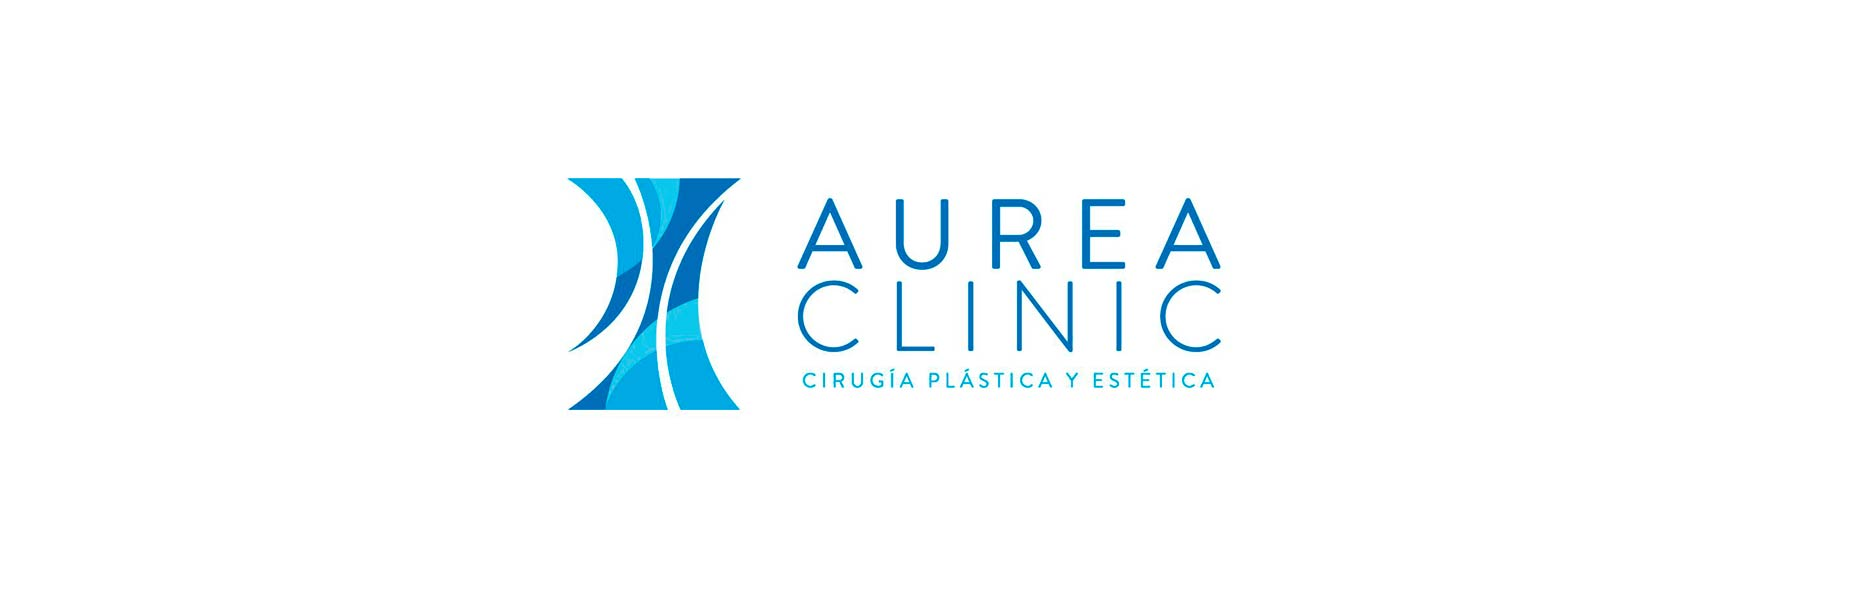 aureaclinicwebsite